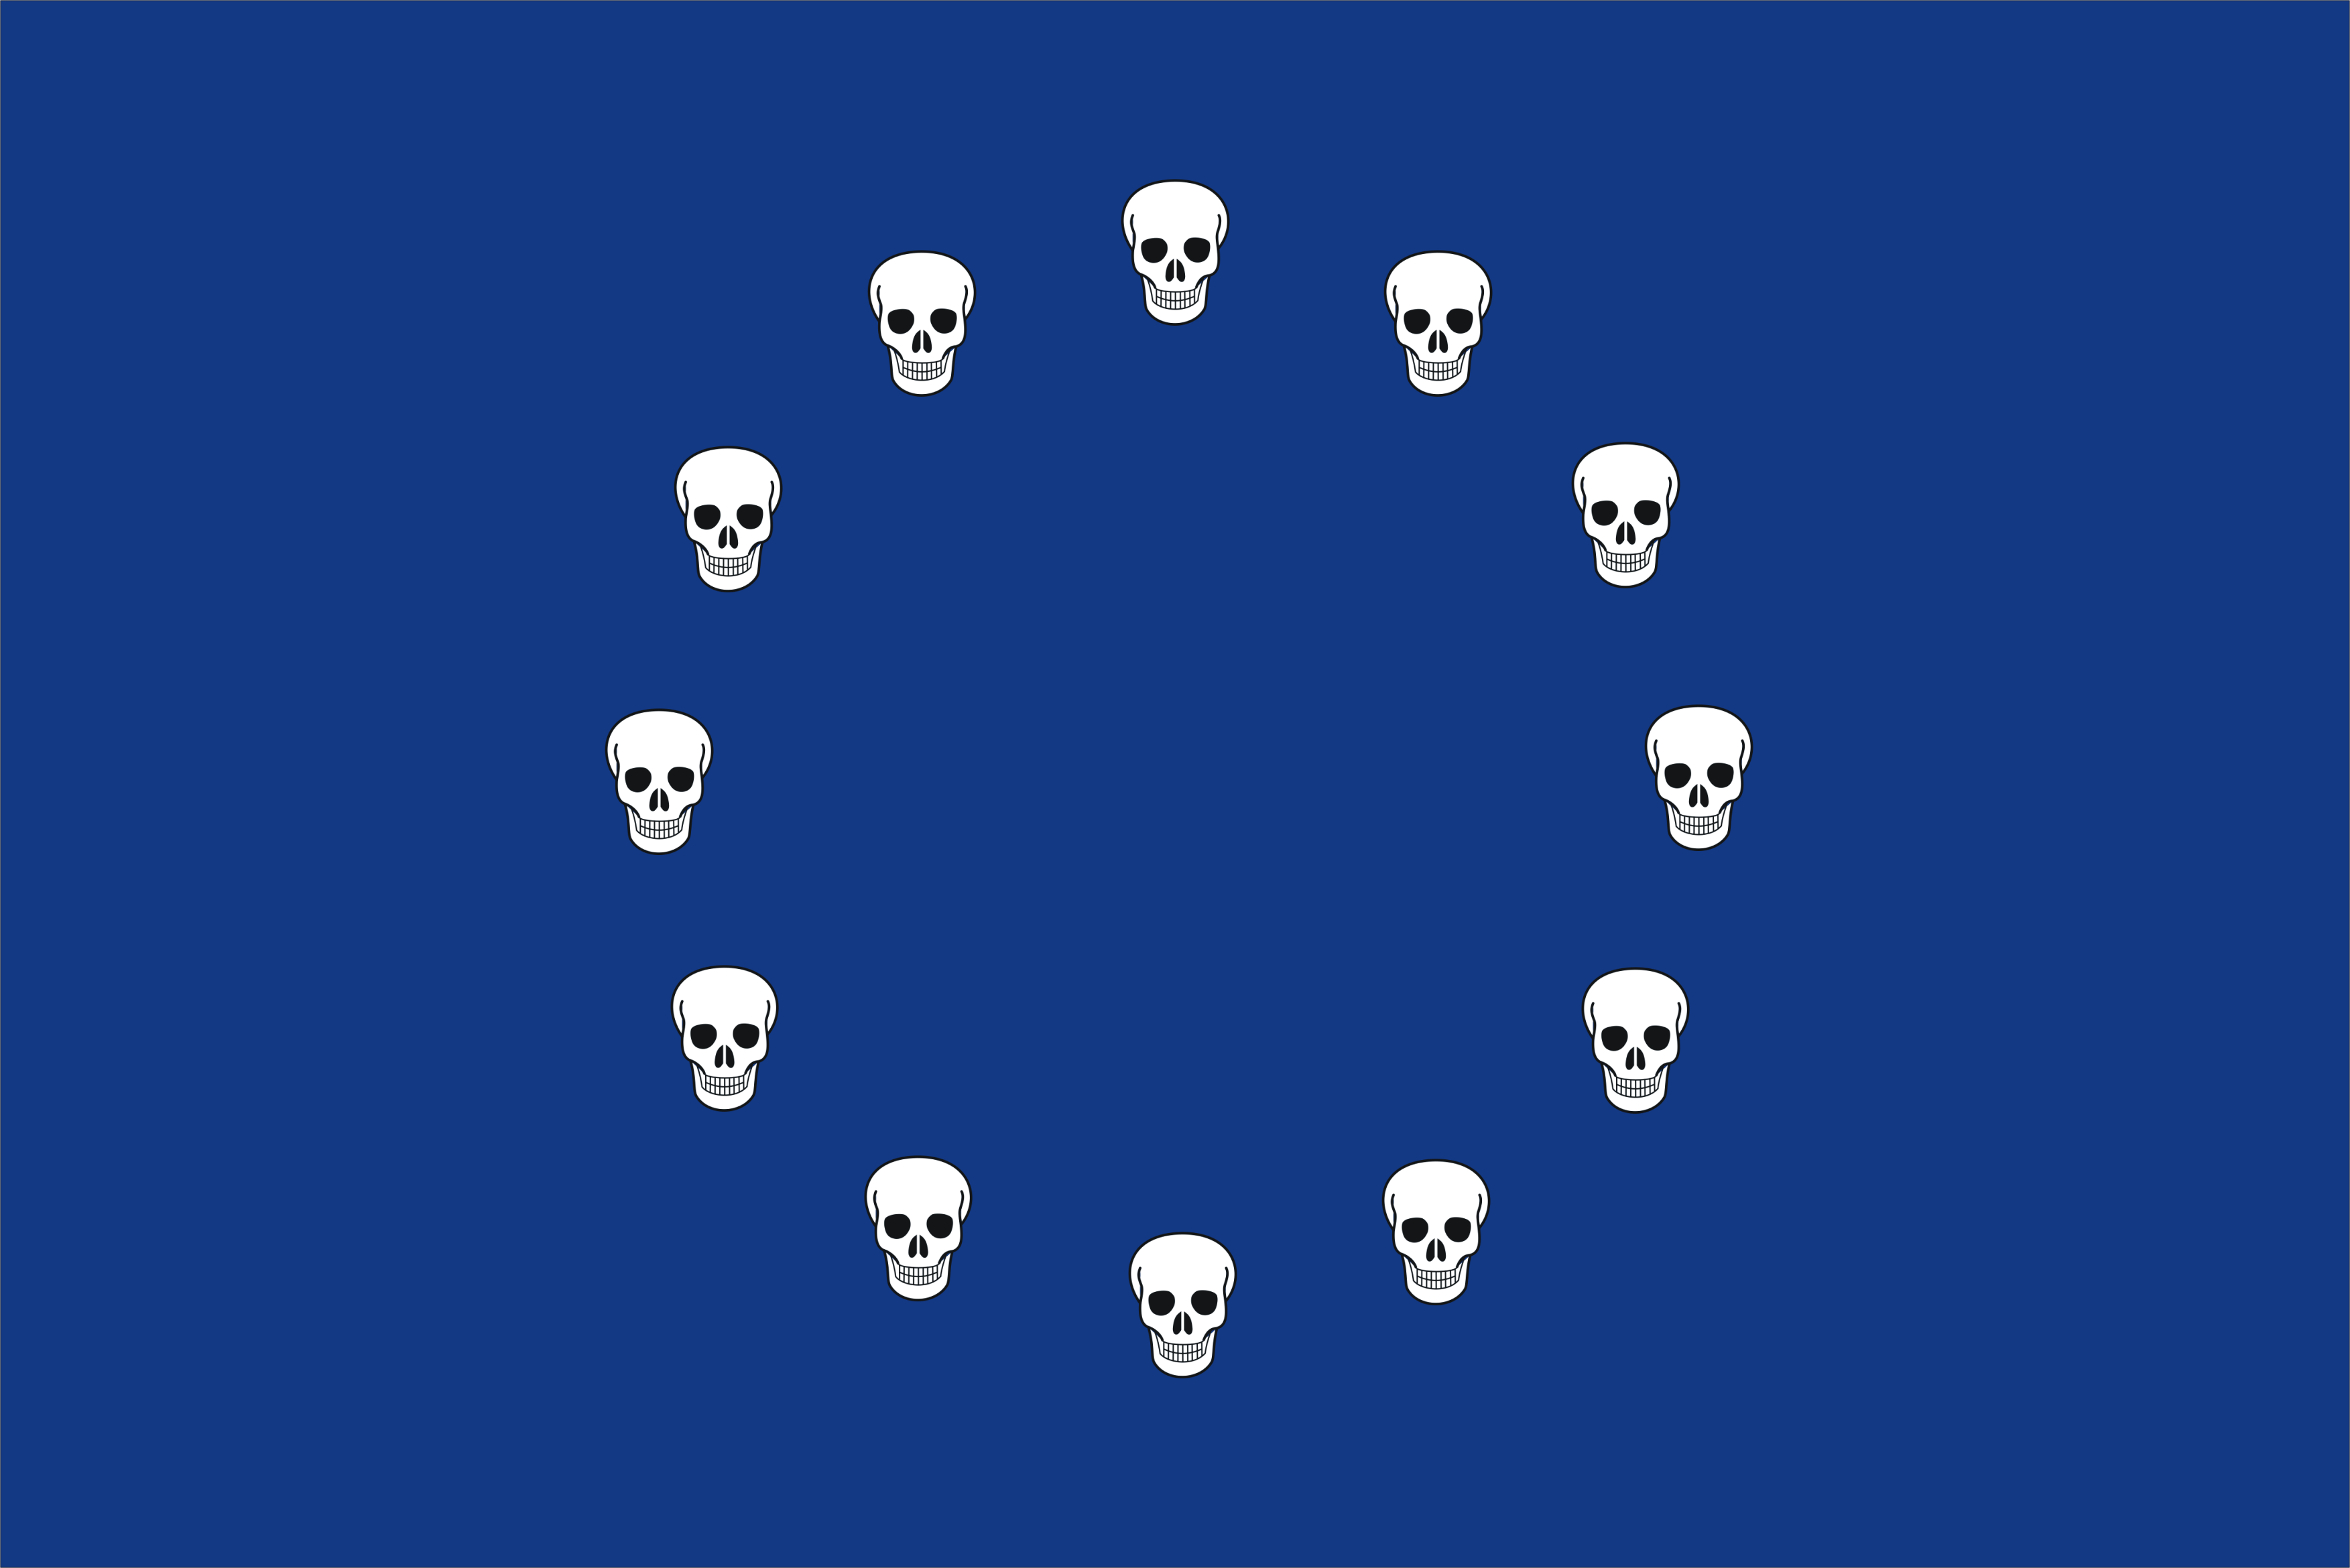 0800 7838422 Hsbc: European Migrant Crisis Wikipedia